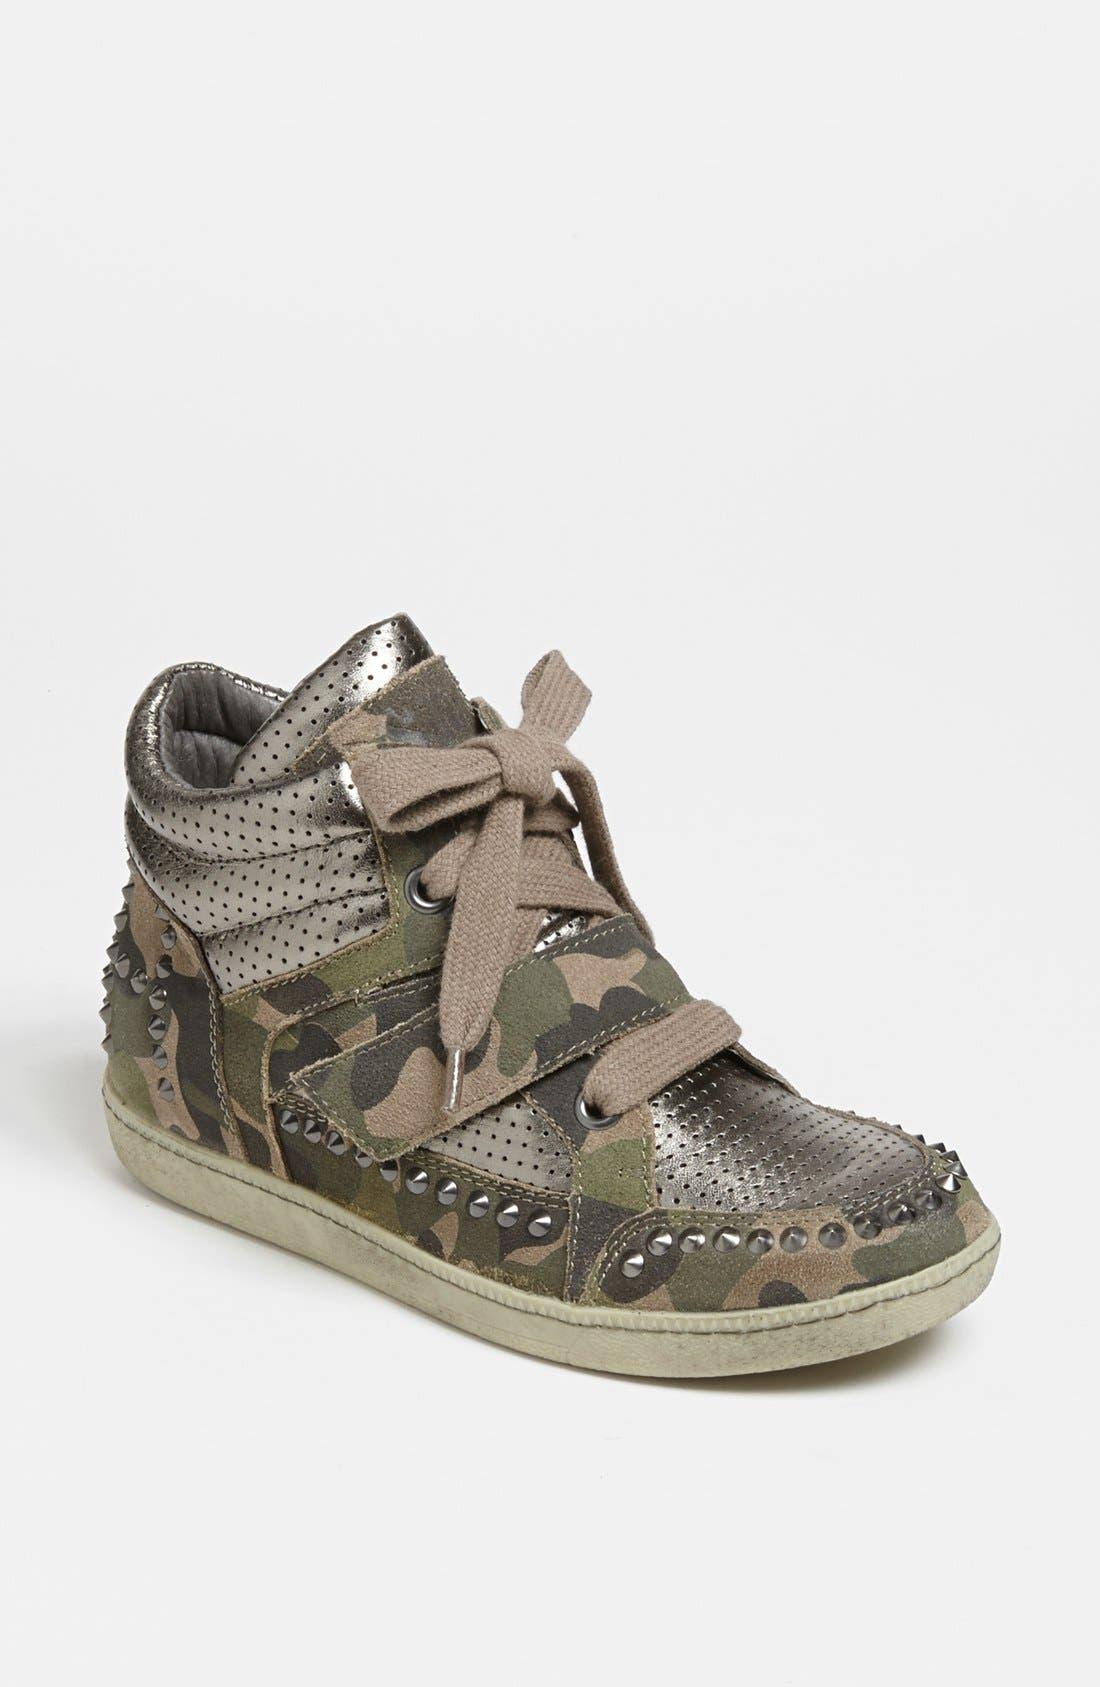 Alternate Image 1 Selected - Ash 'Zed' High Top Sneaker